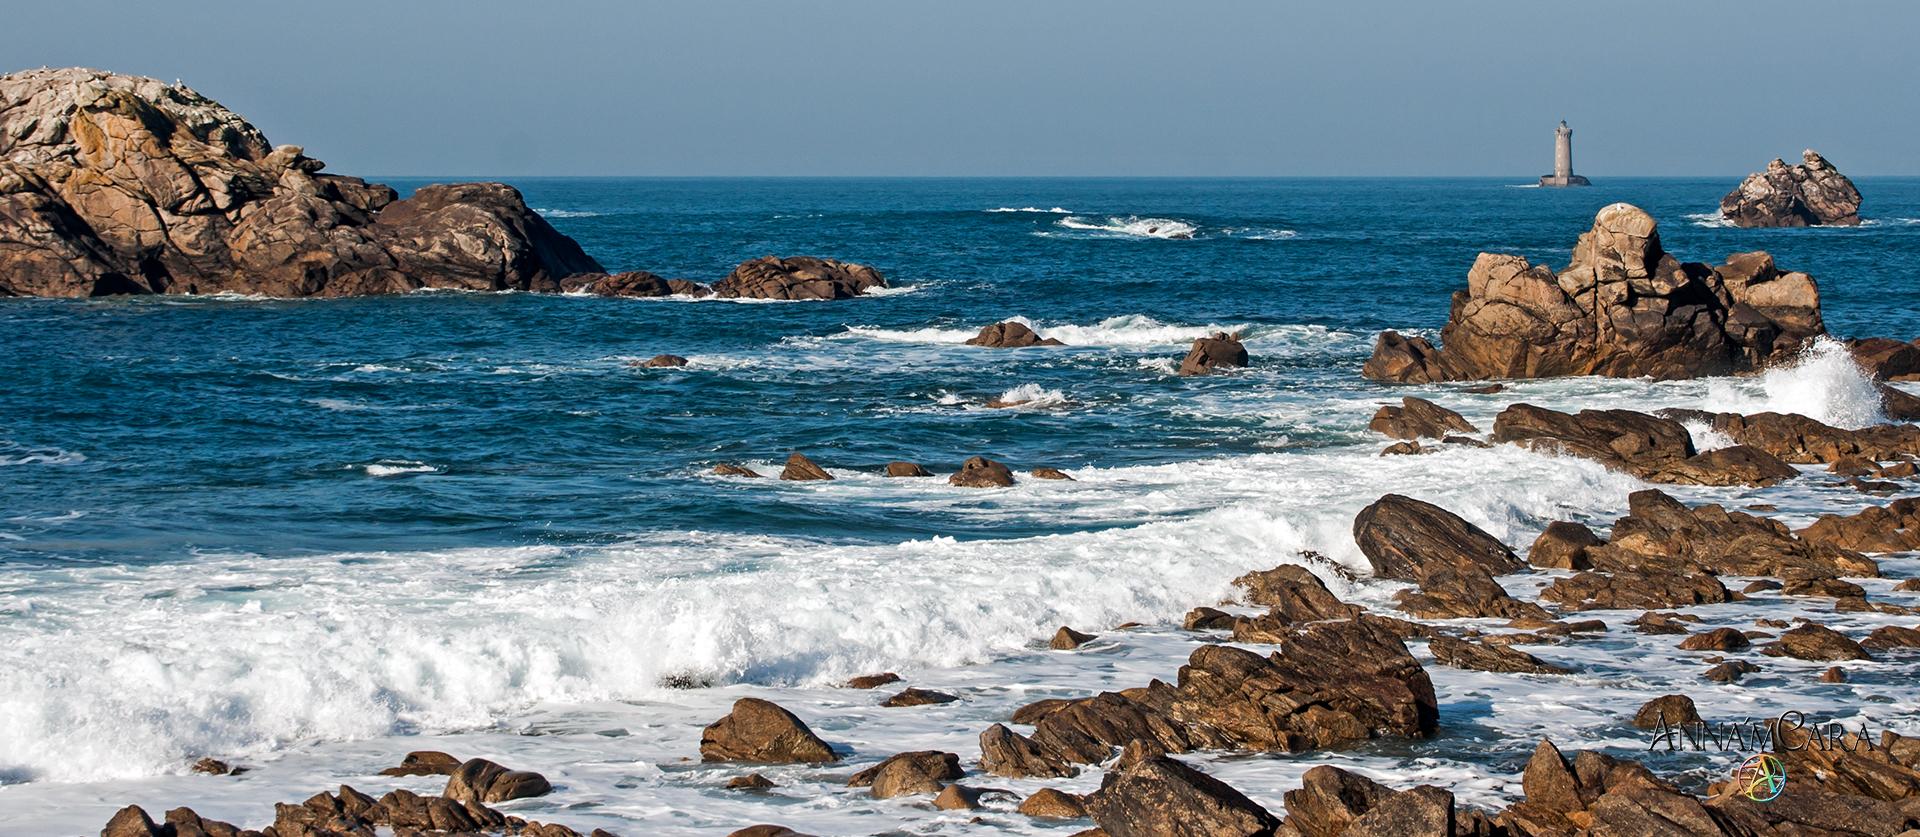 AnnamCara - Blog - Kuriose Tage - Tag des Meeres - Phare le four